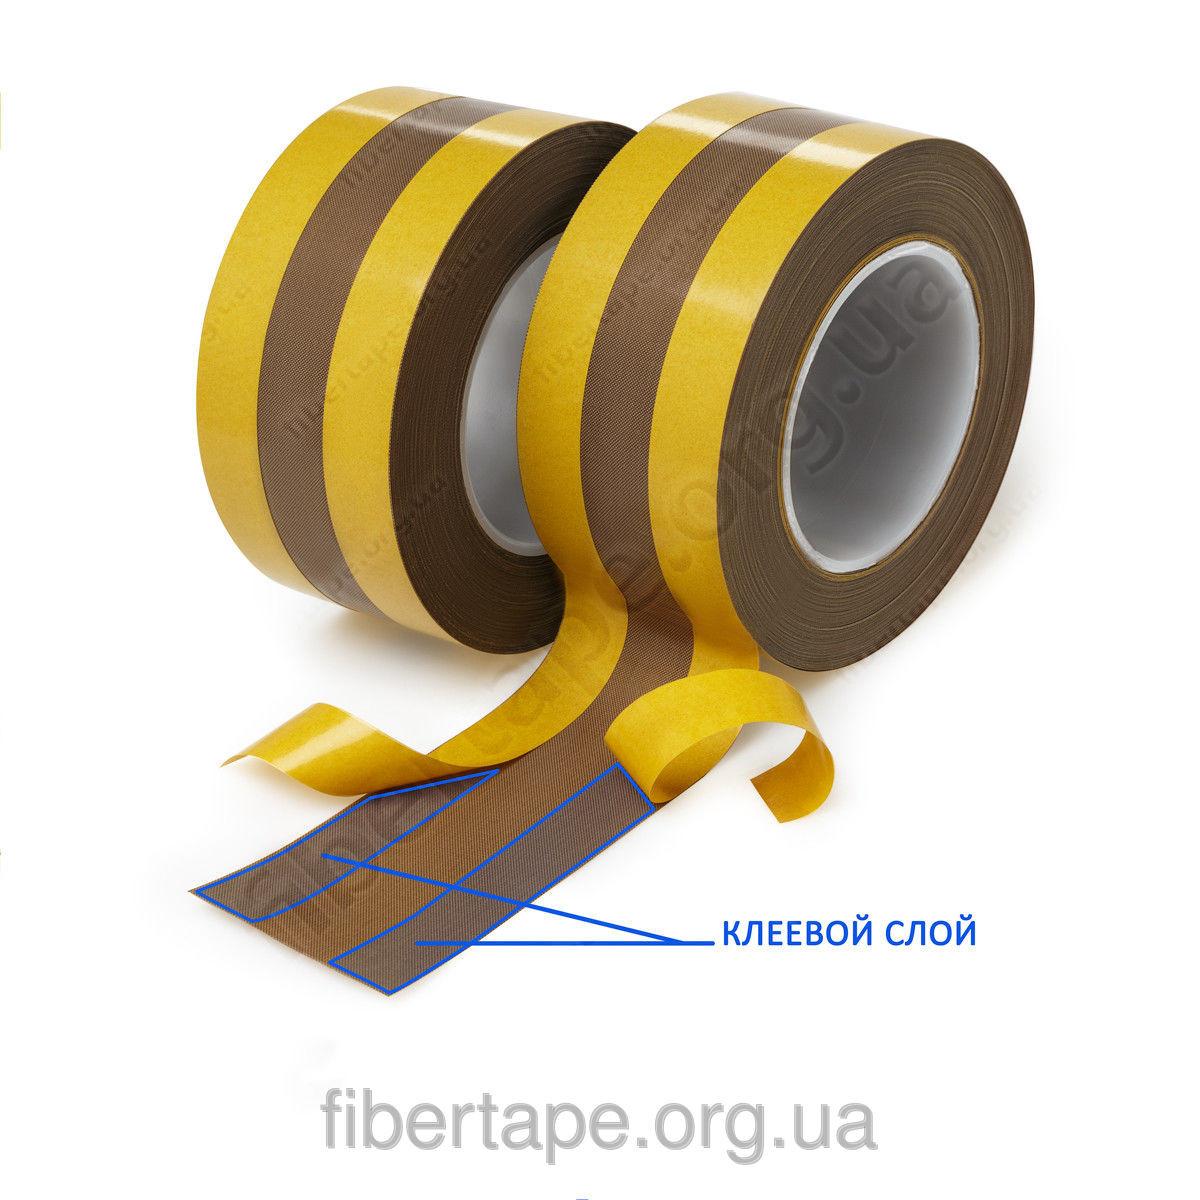 Тефлоновая лента зональная, ширина 60 мм, длина 30 м, (20+20+20), 125 микрон